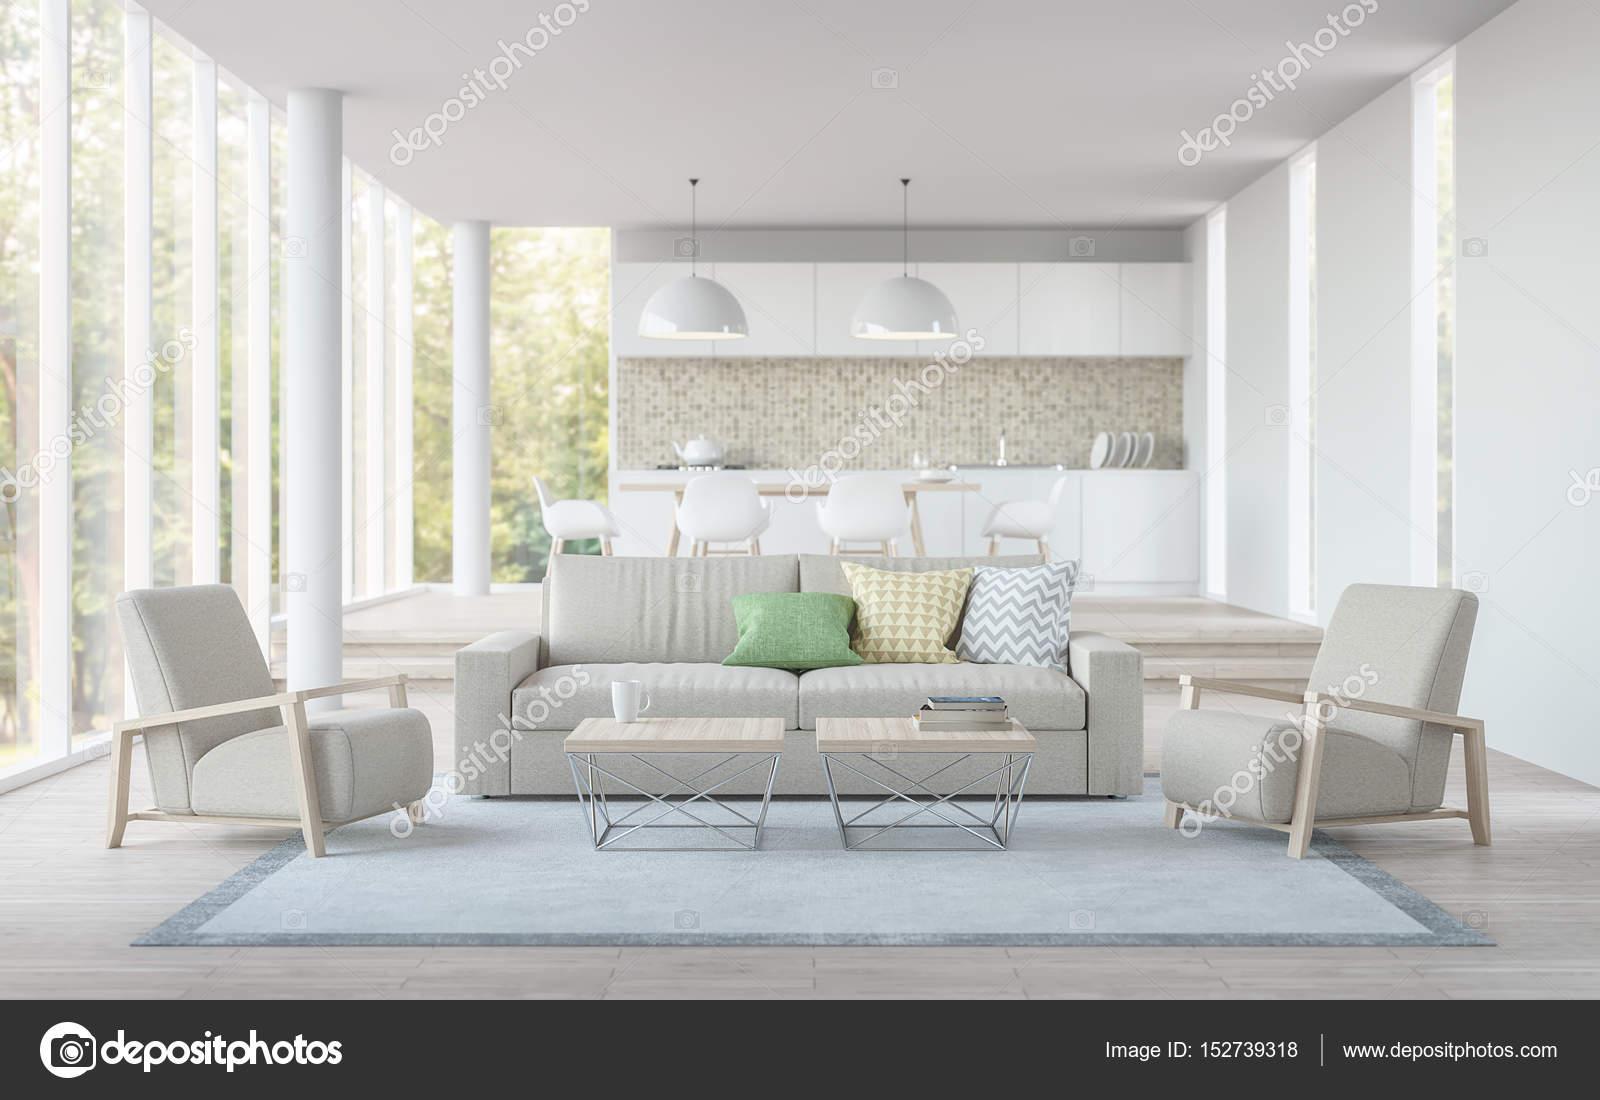 Modern living, salle à manger et cuisine 3d rendu image blanc ...